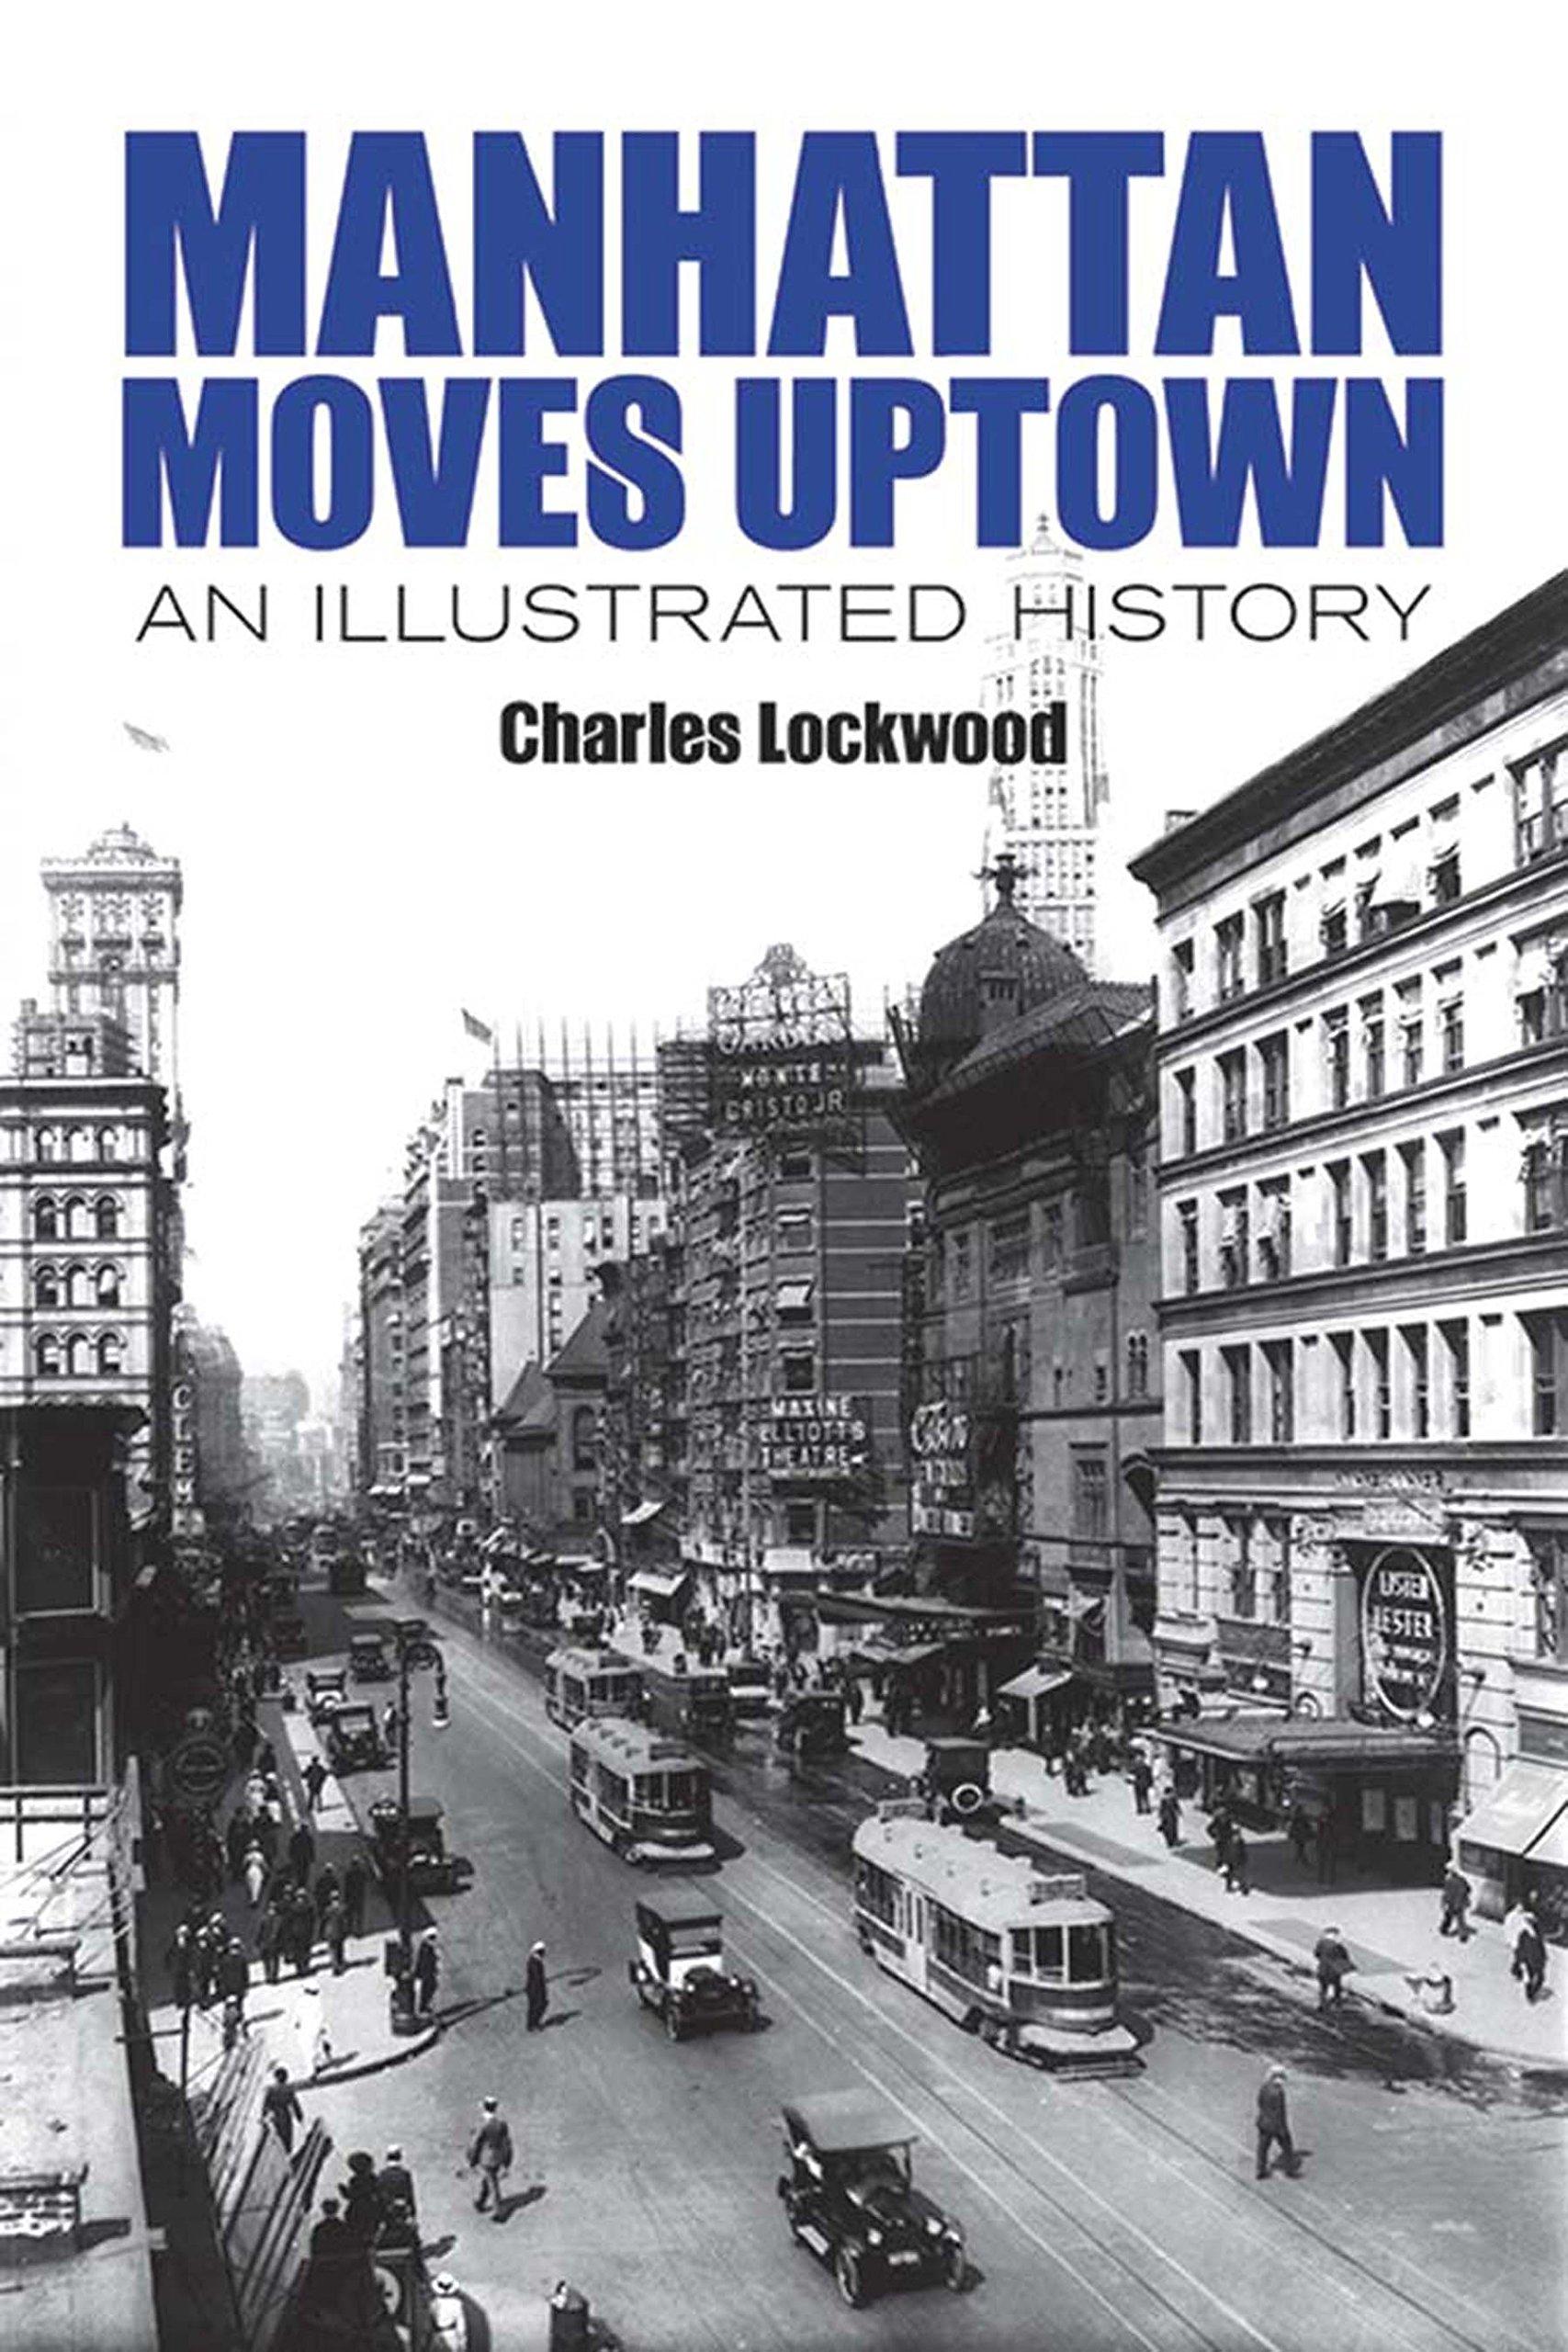 Manhattan Moves Uptown: An Illustrated History (New York City) pdf epub